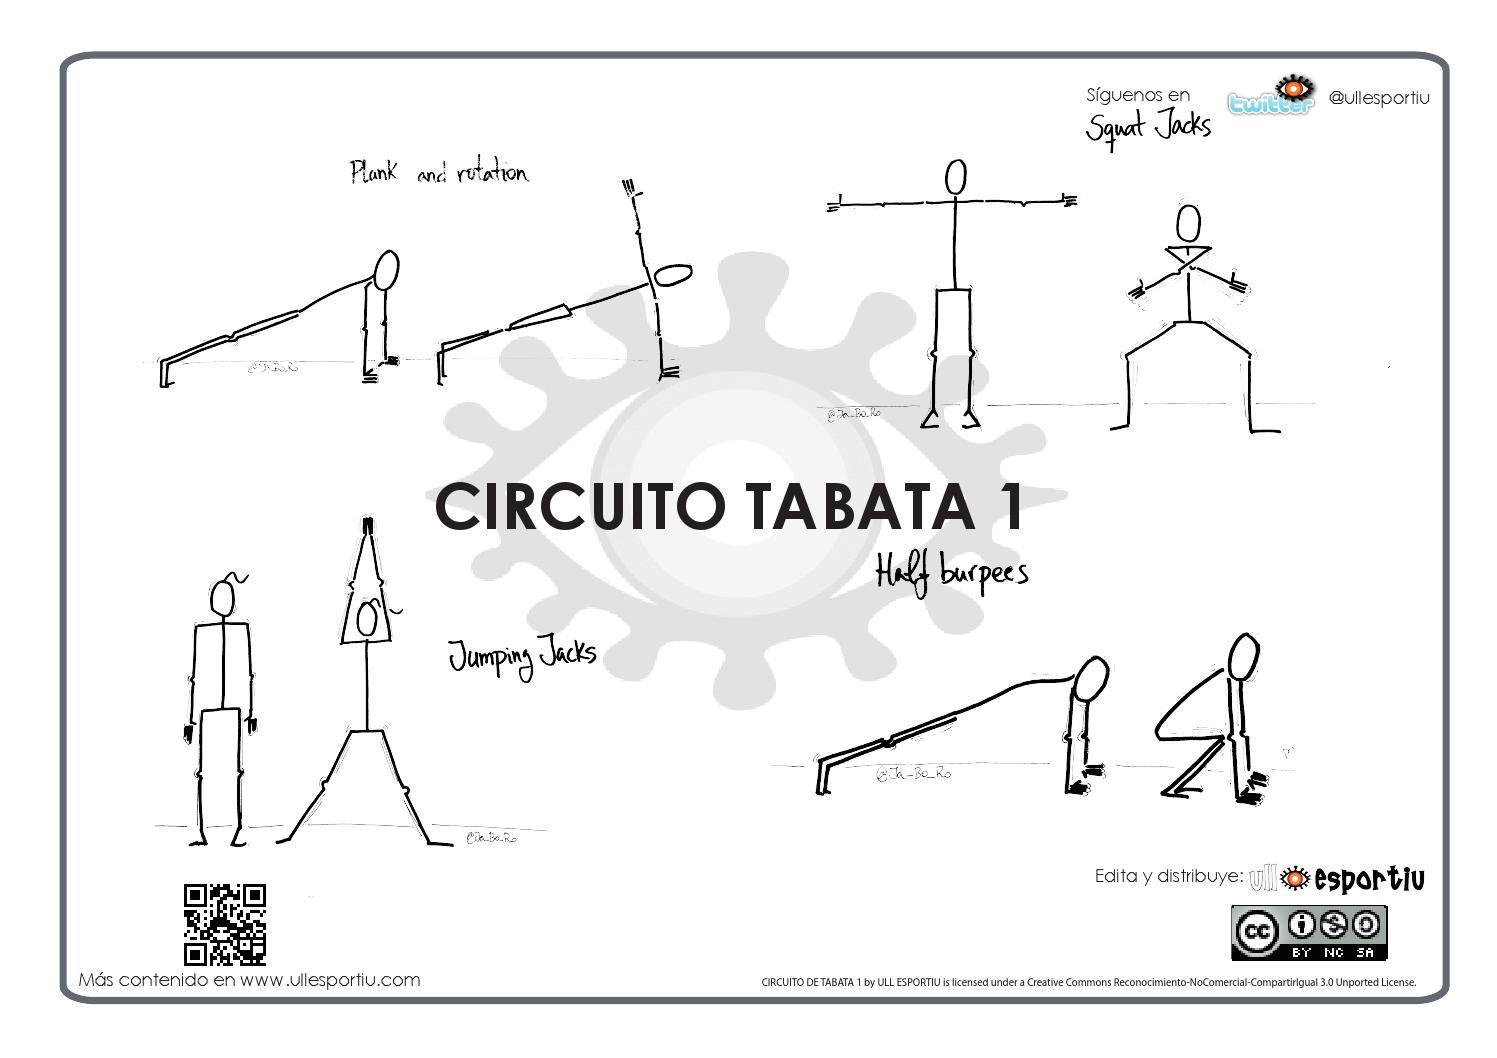 Circuito Tabata : Circuito tabata by ull esportiu issuu